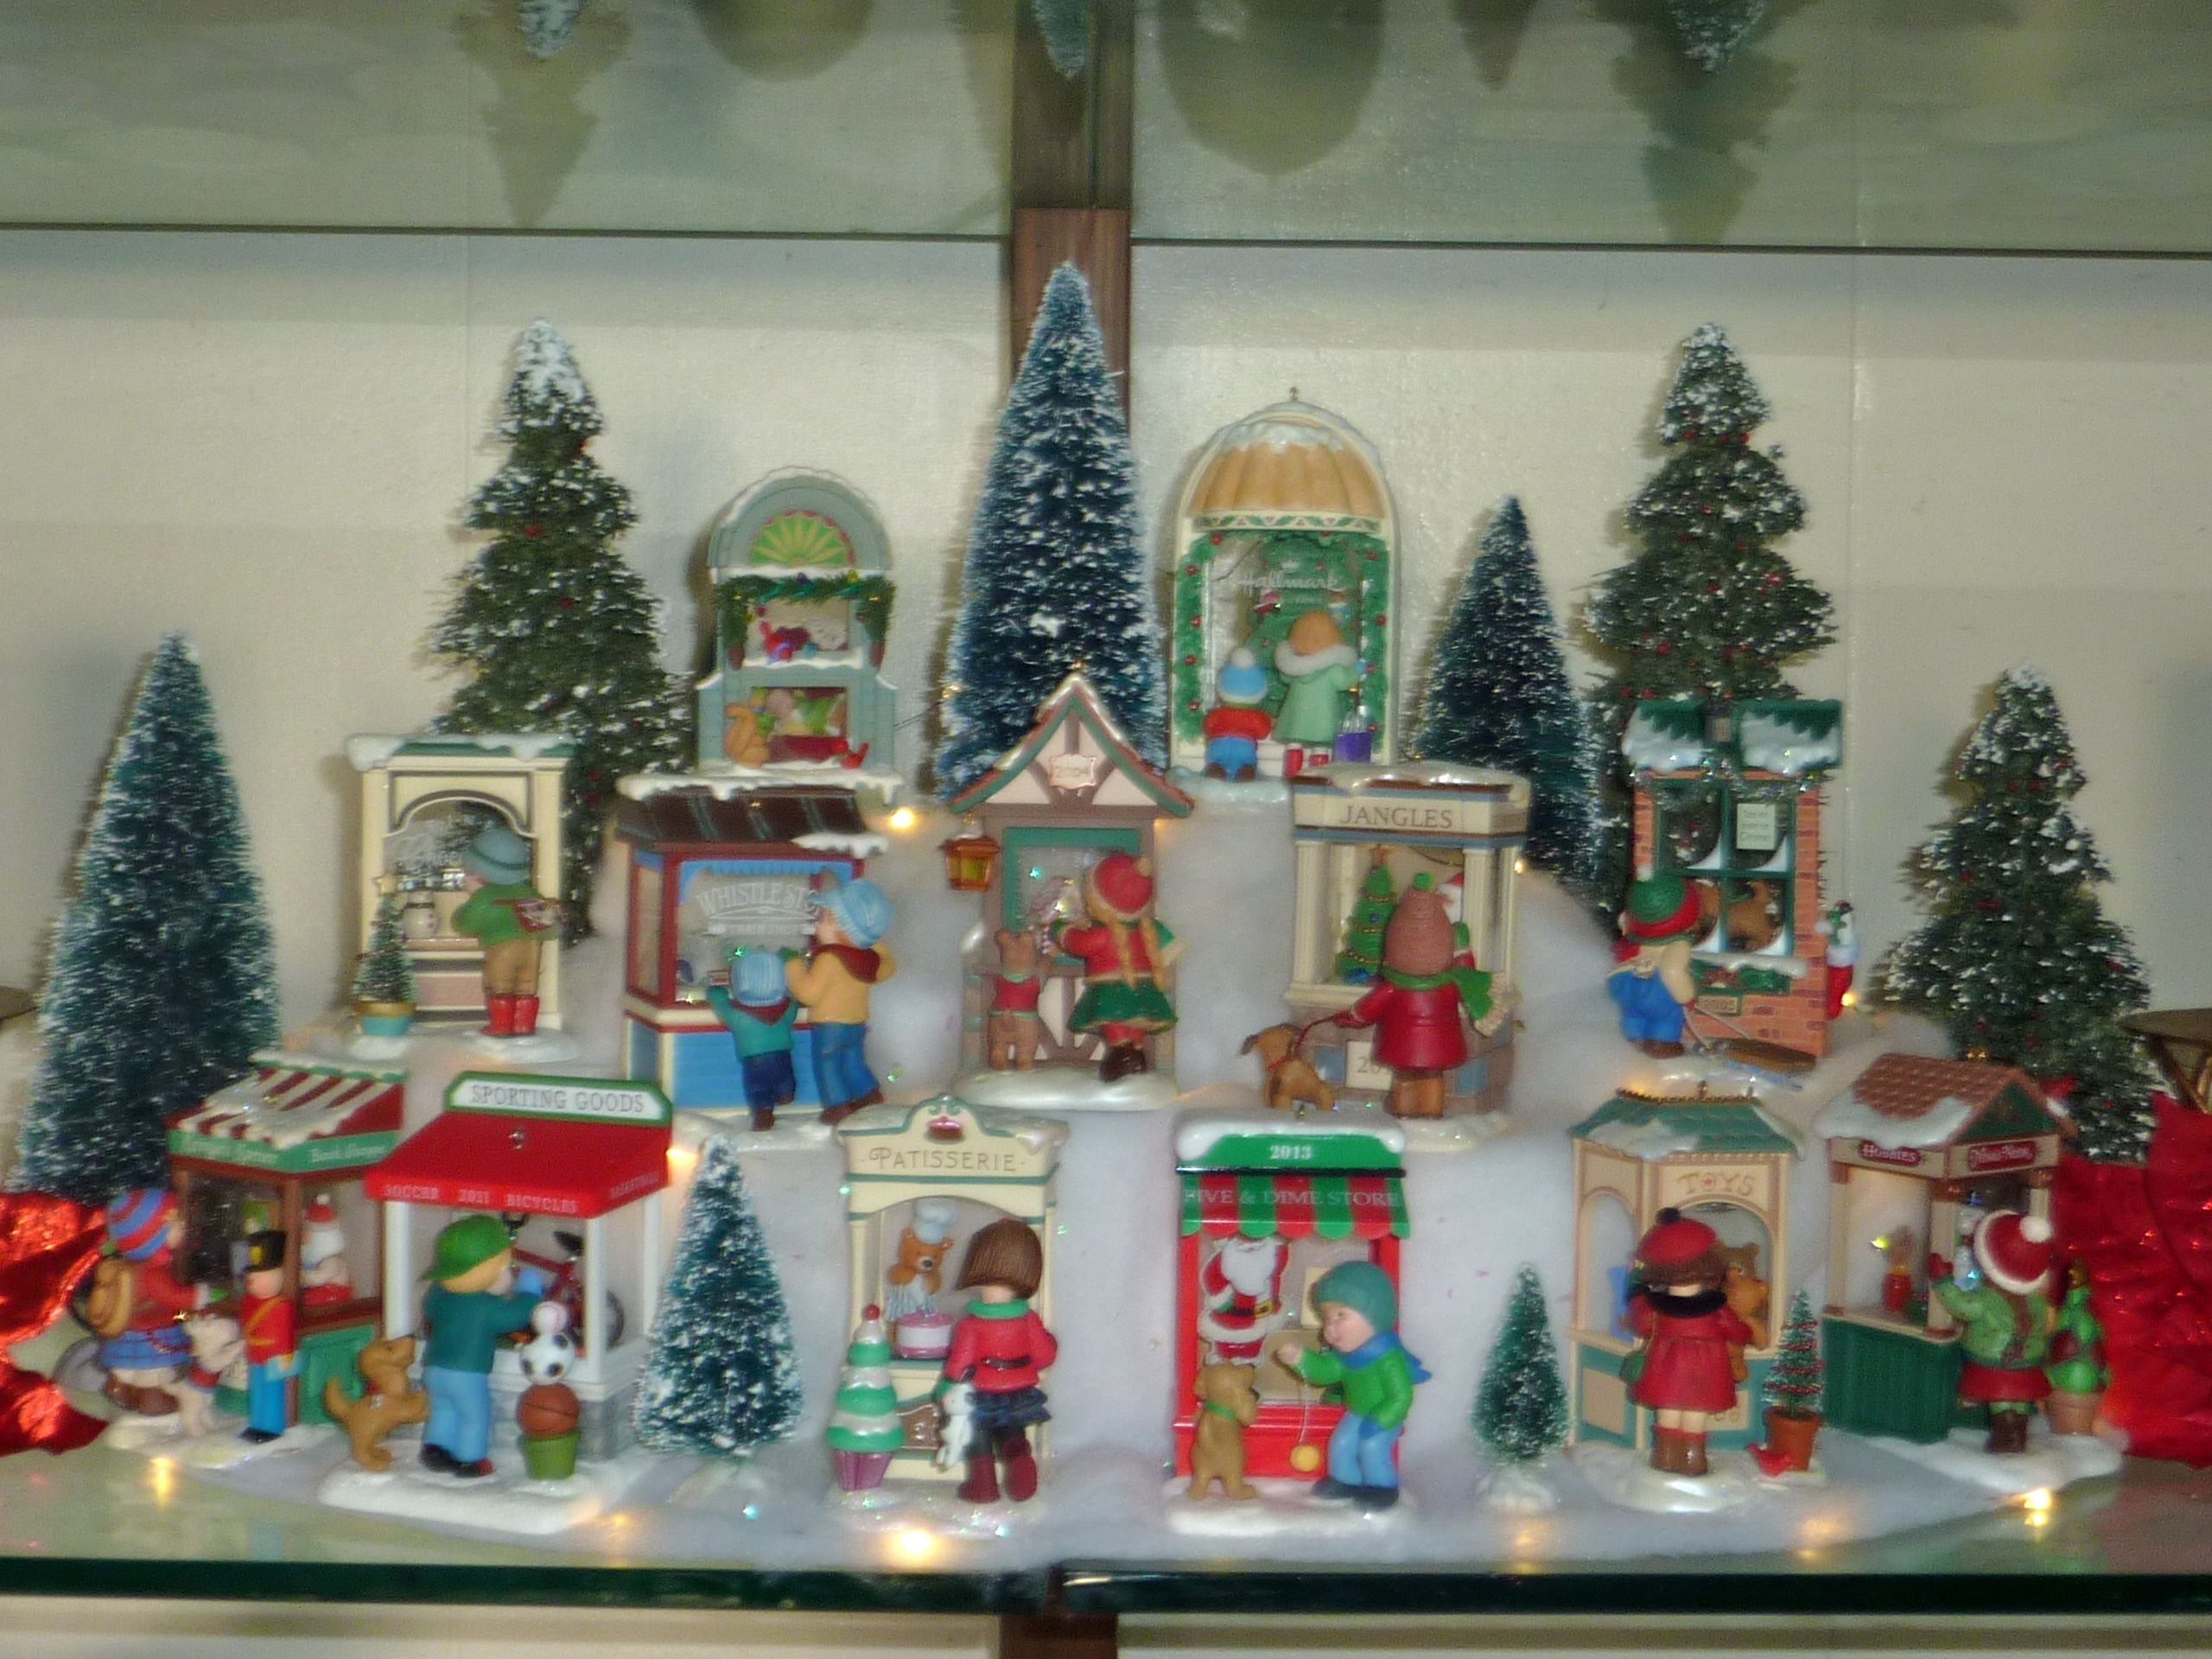 Hallmark Christmas Windows Display 2014 Hallmark